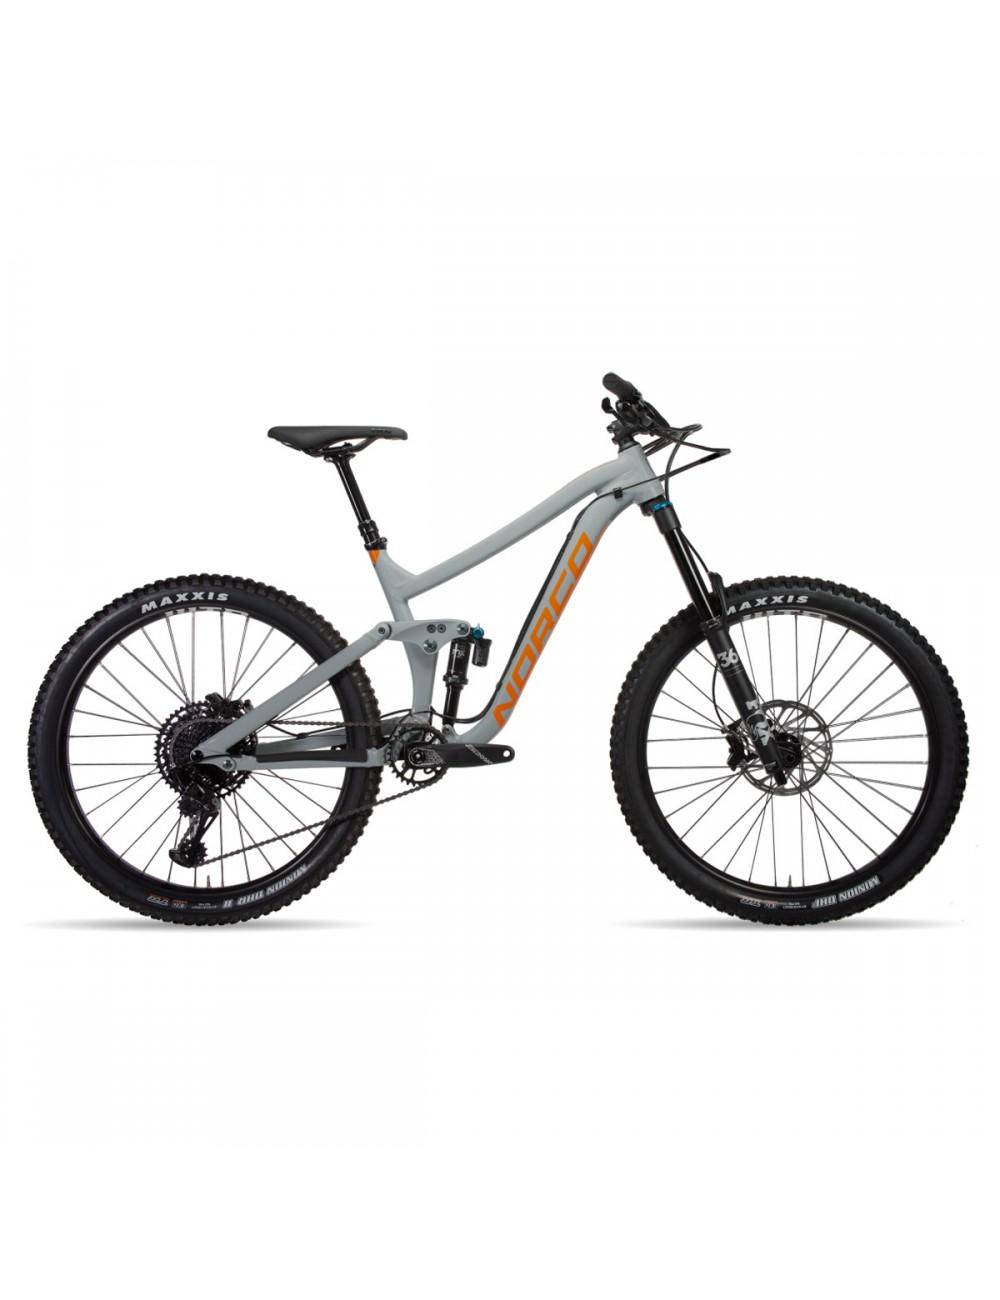 Norco Range A9.1 Bike - Concrete/Orange_11536